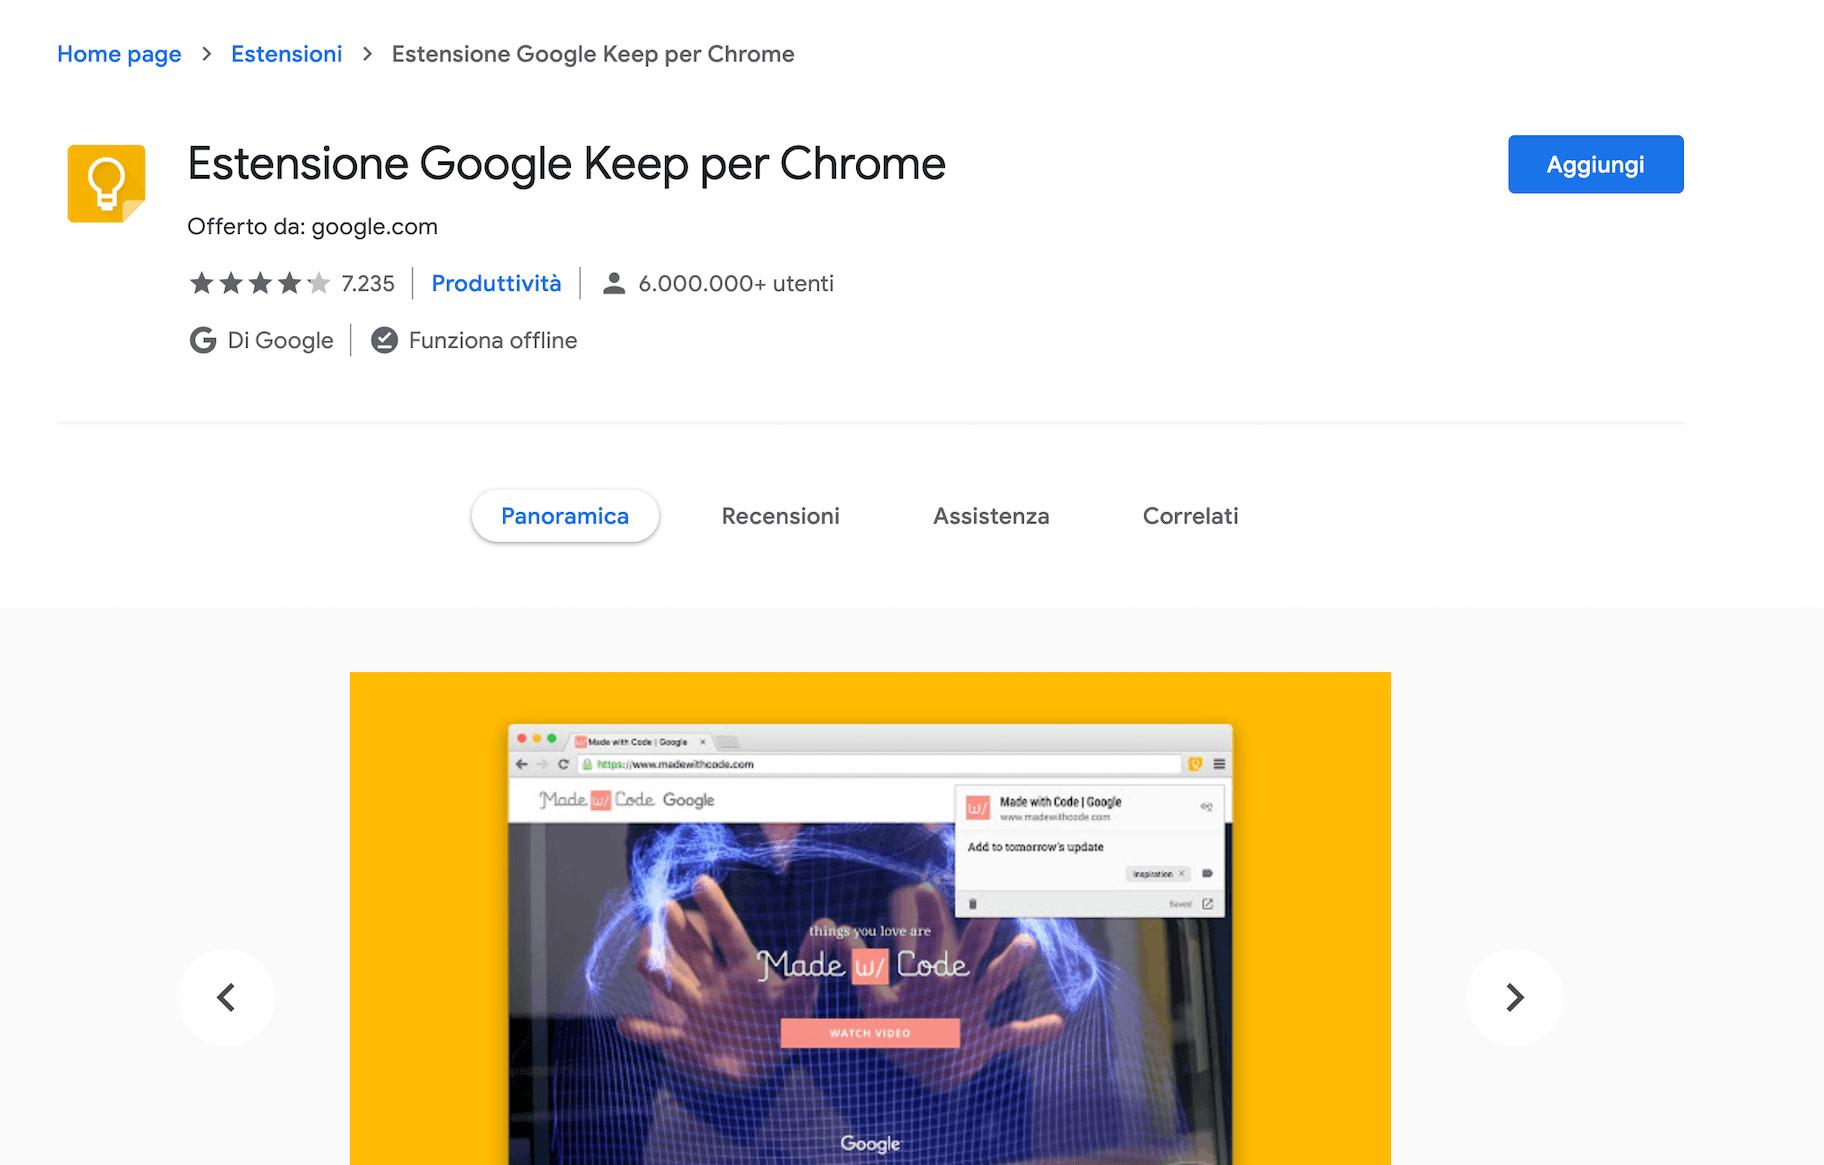 estensione google keep per chrome